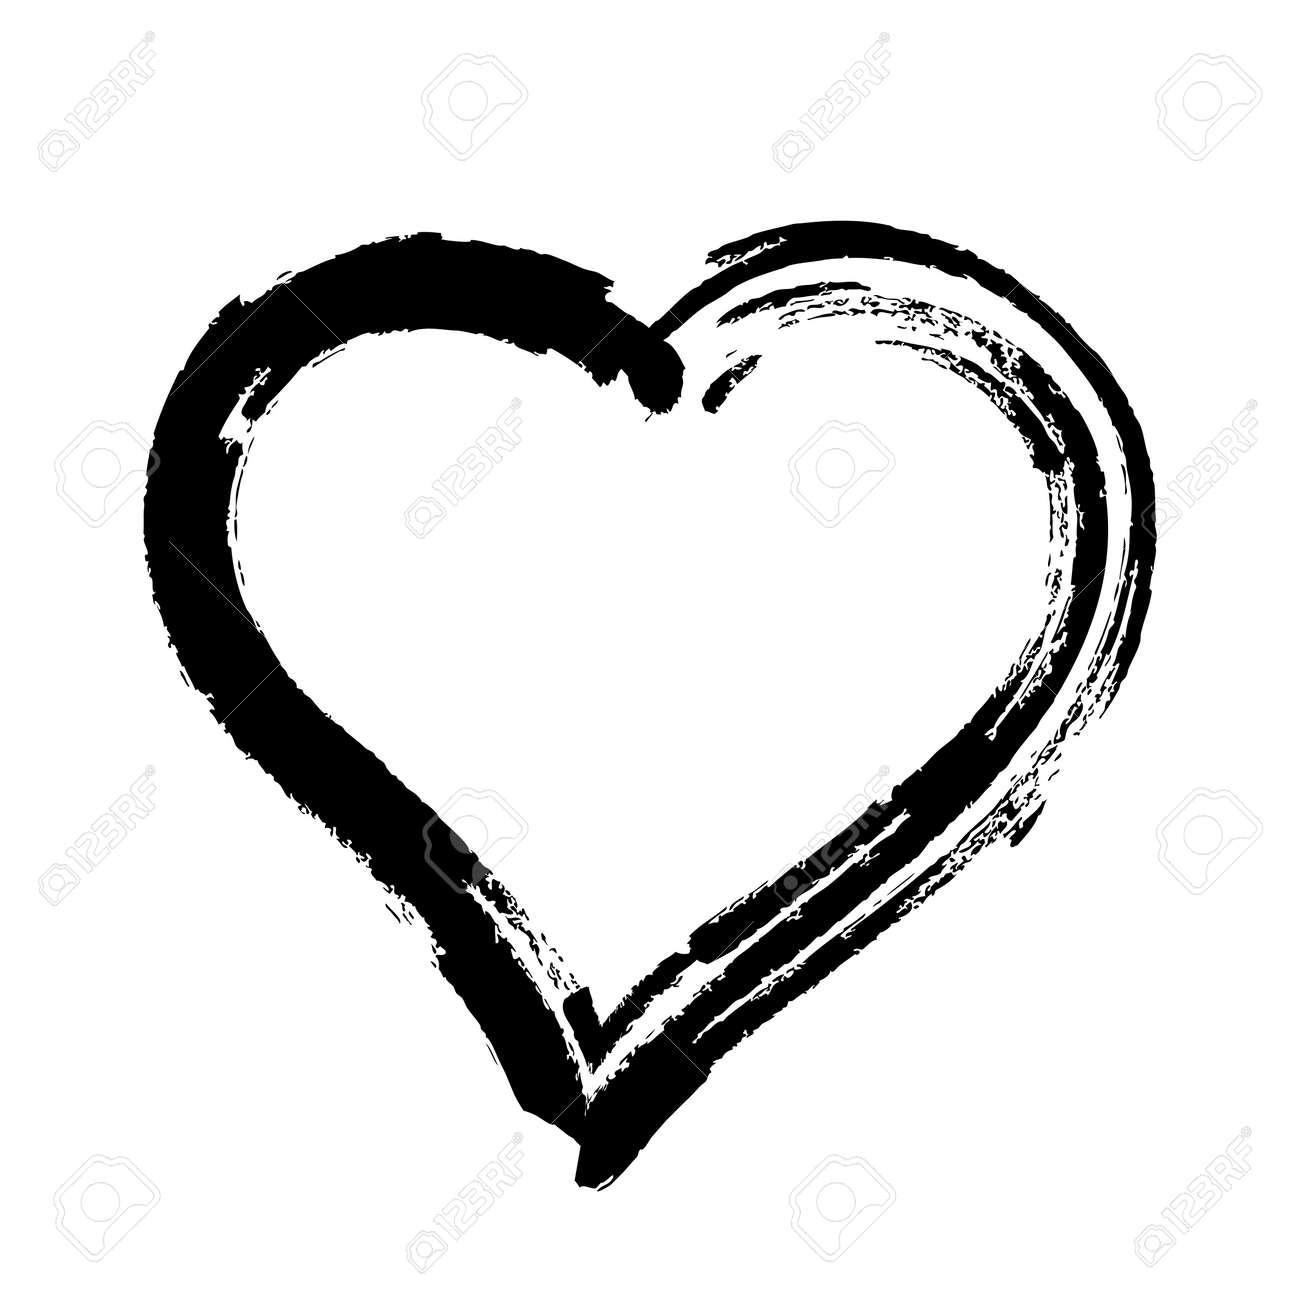 scribble heart shape sketch black color, hand drawn heart symbol isolated on white, heart shape in paint stripe brush stroke - 166586630